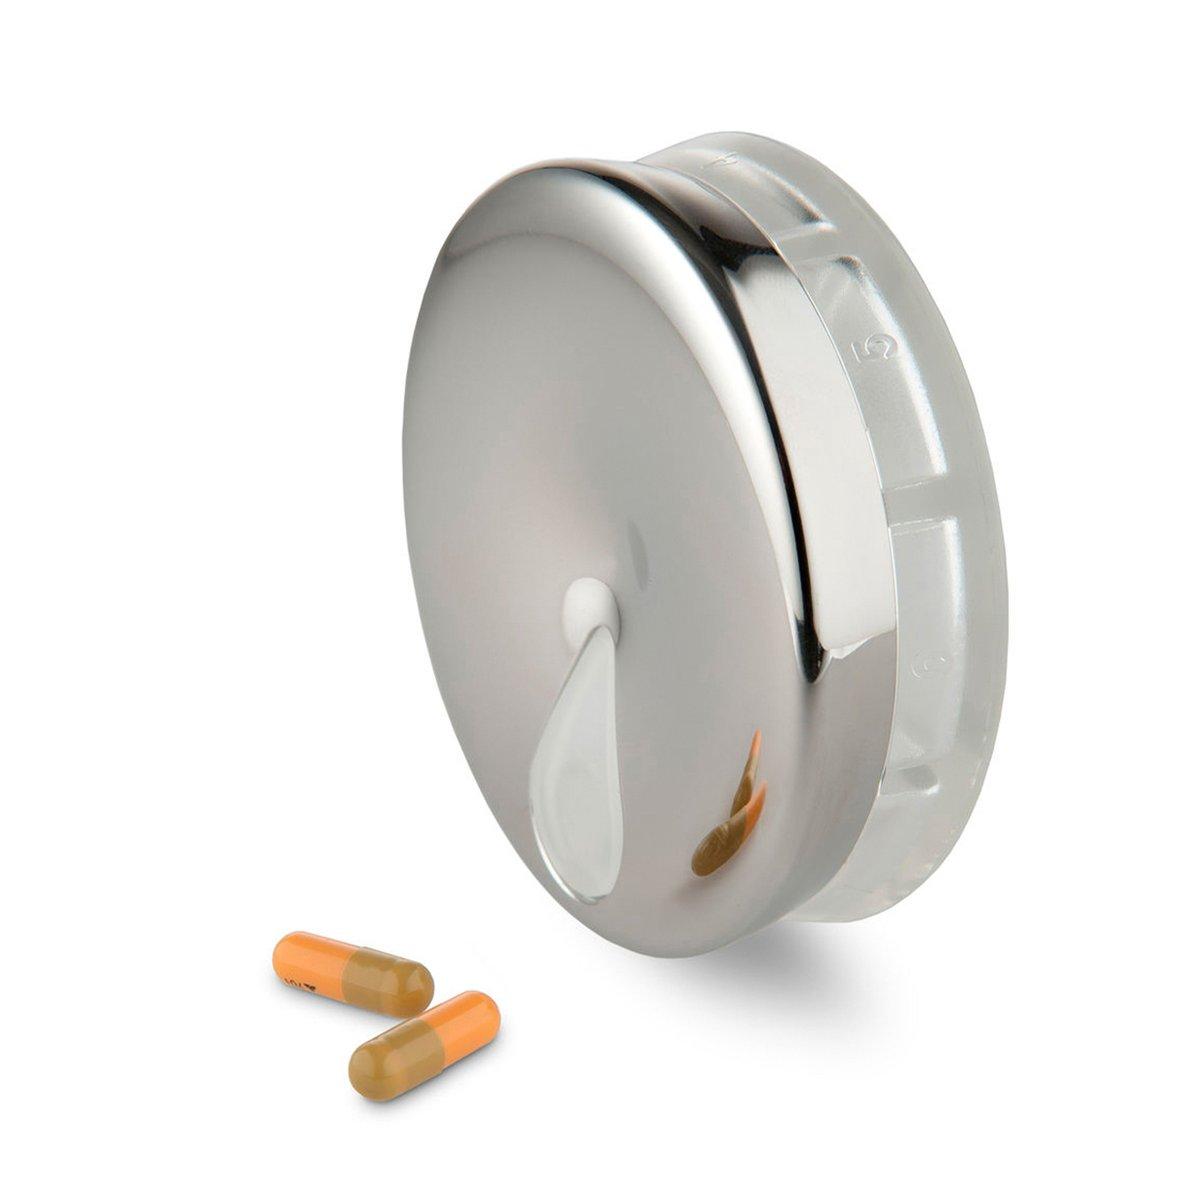 reasonable price save up to 80% lower price with boîte à pilules YoYo